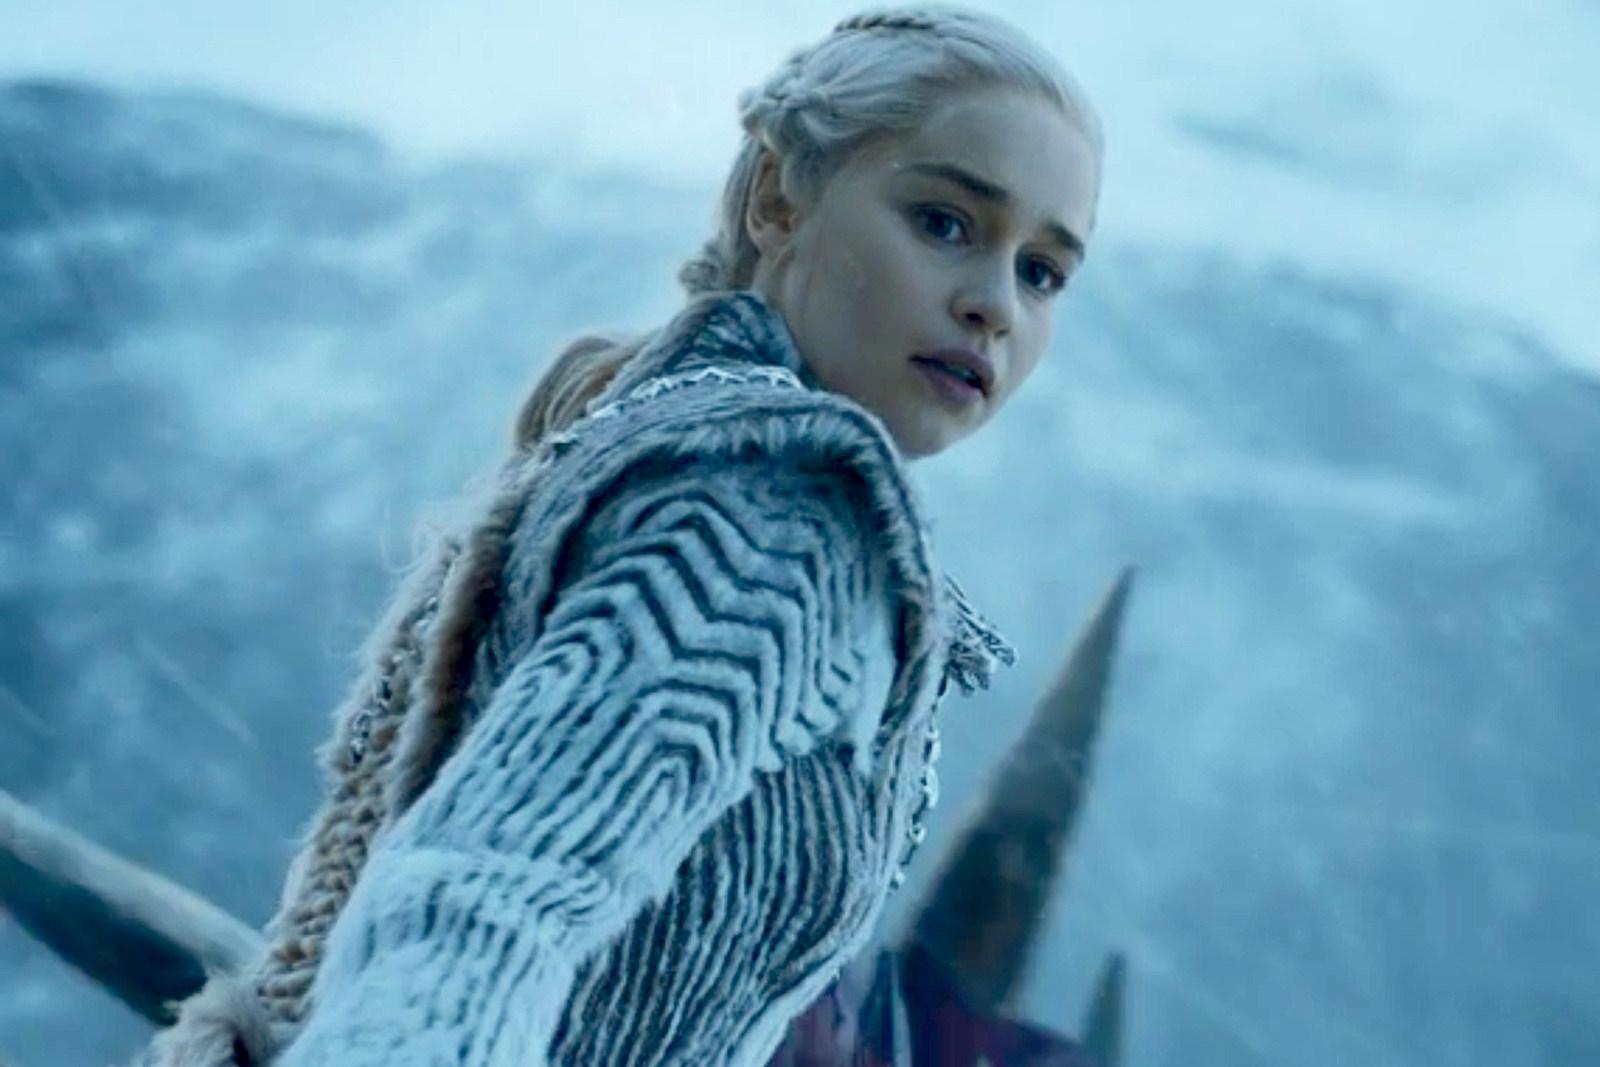 Game Of Thrones Season 8 Photos Hint At White Walker Upgrade